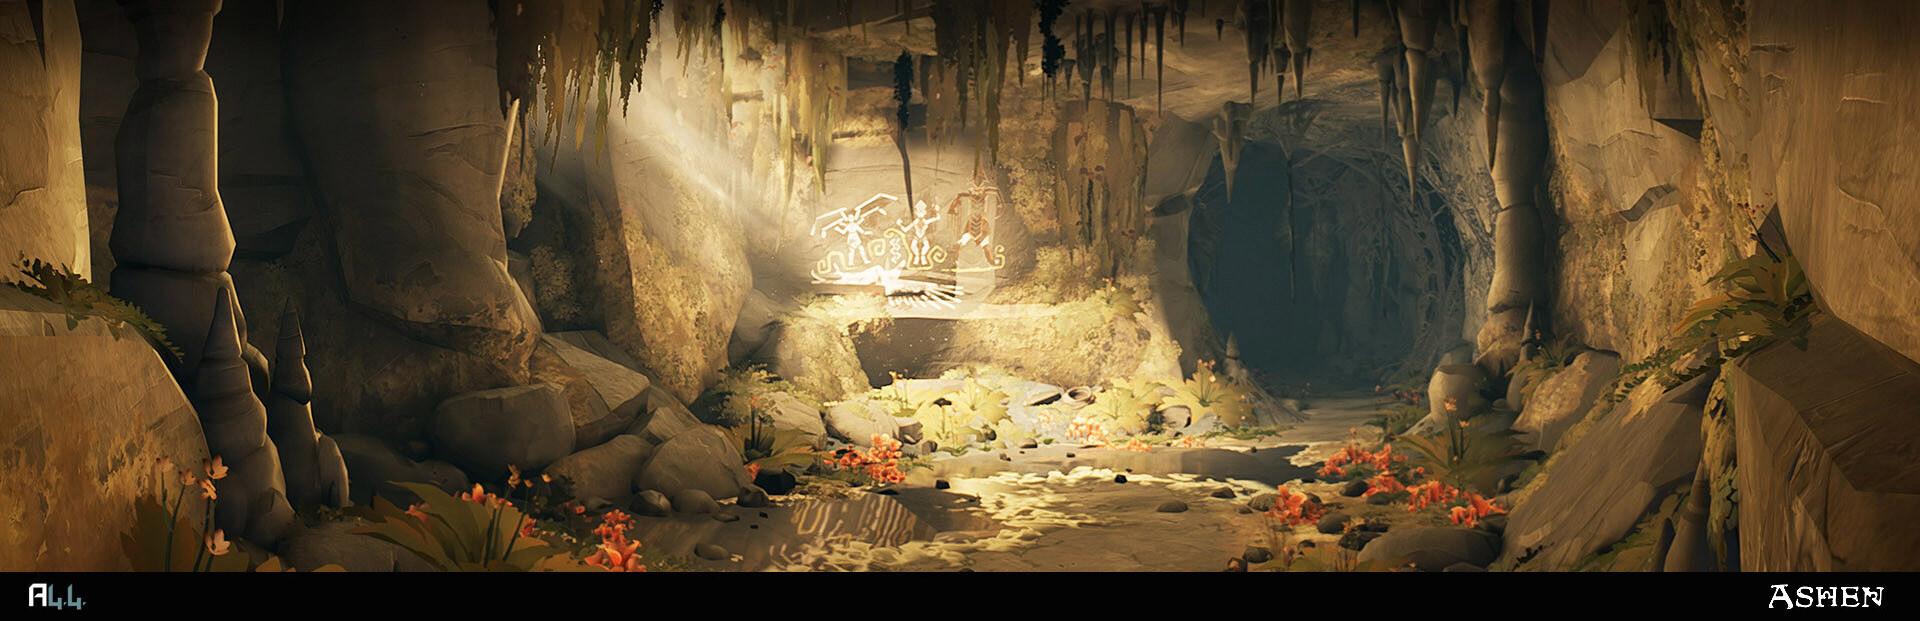 Pat dunal dlc caves 02